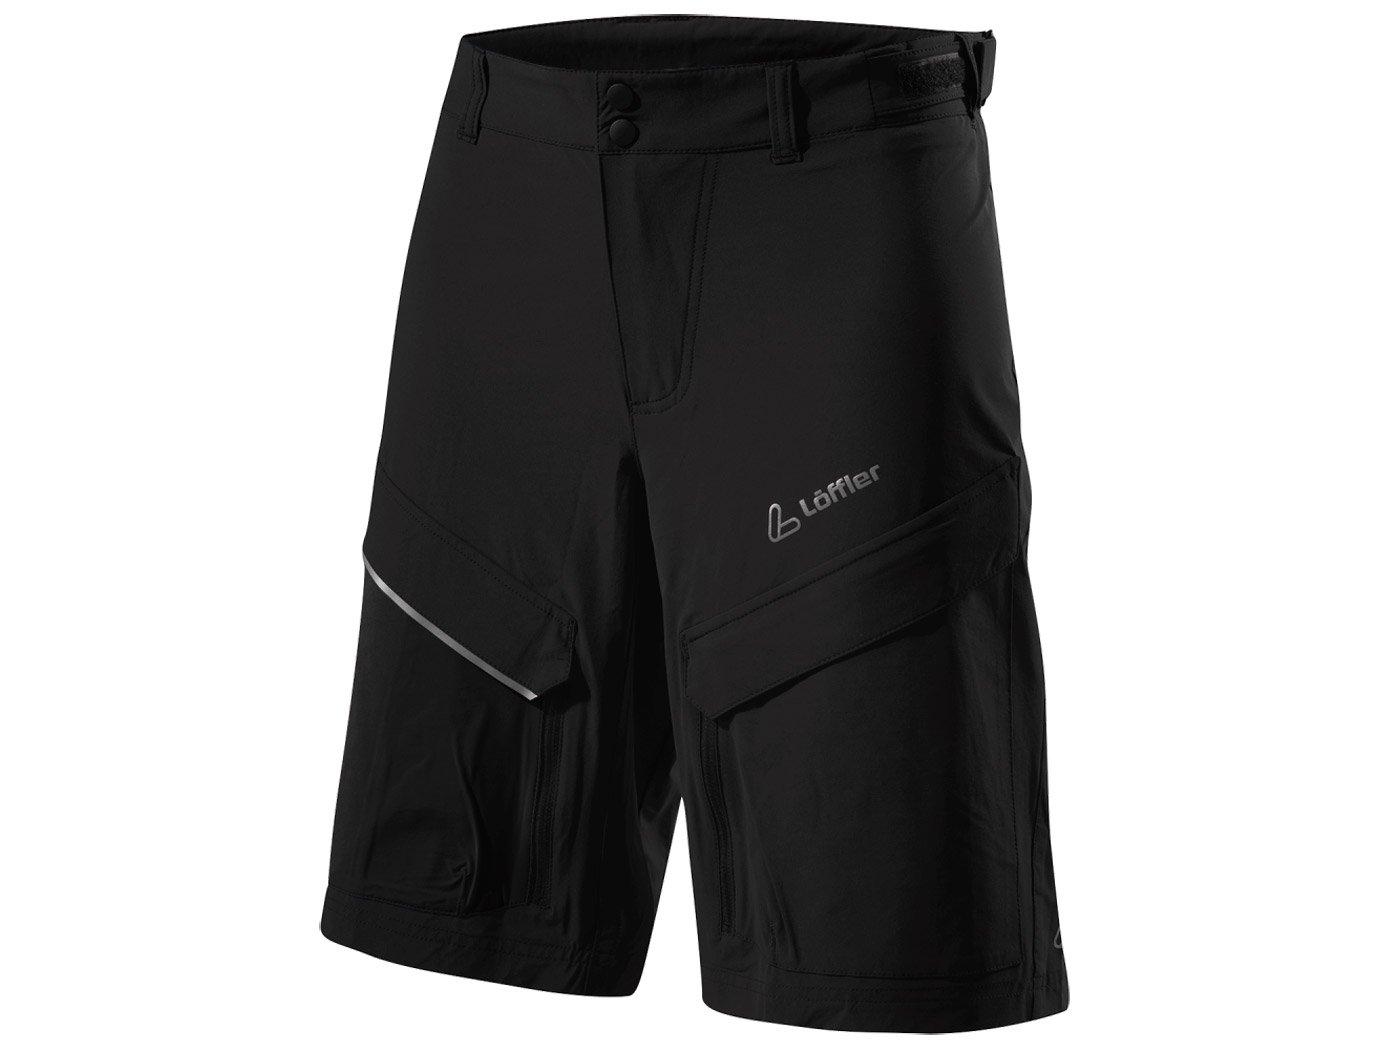 Löffler Herren Bike Shorts 17824 - Radshorts mit Innenhose